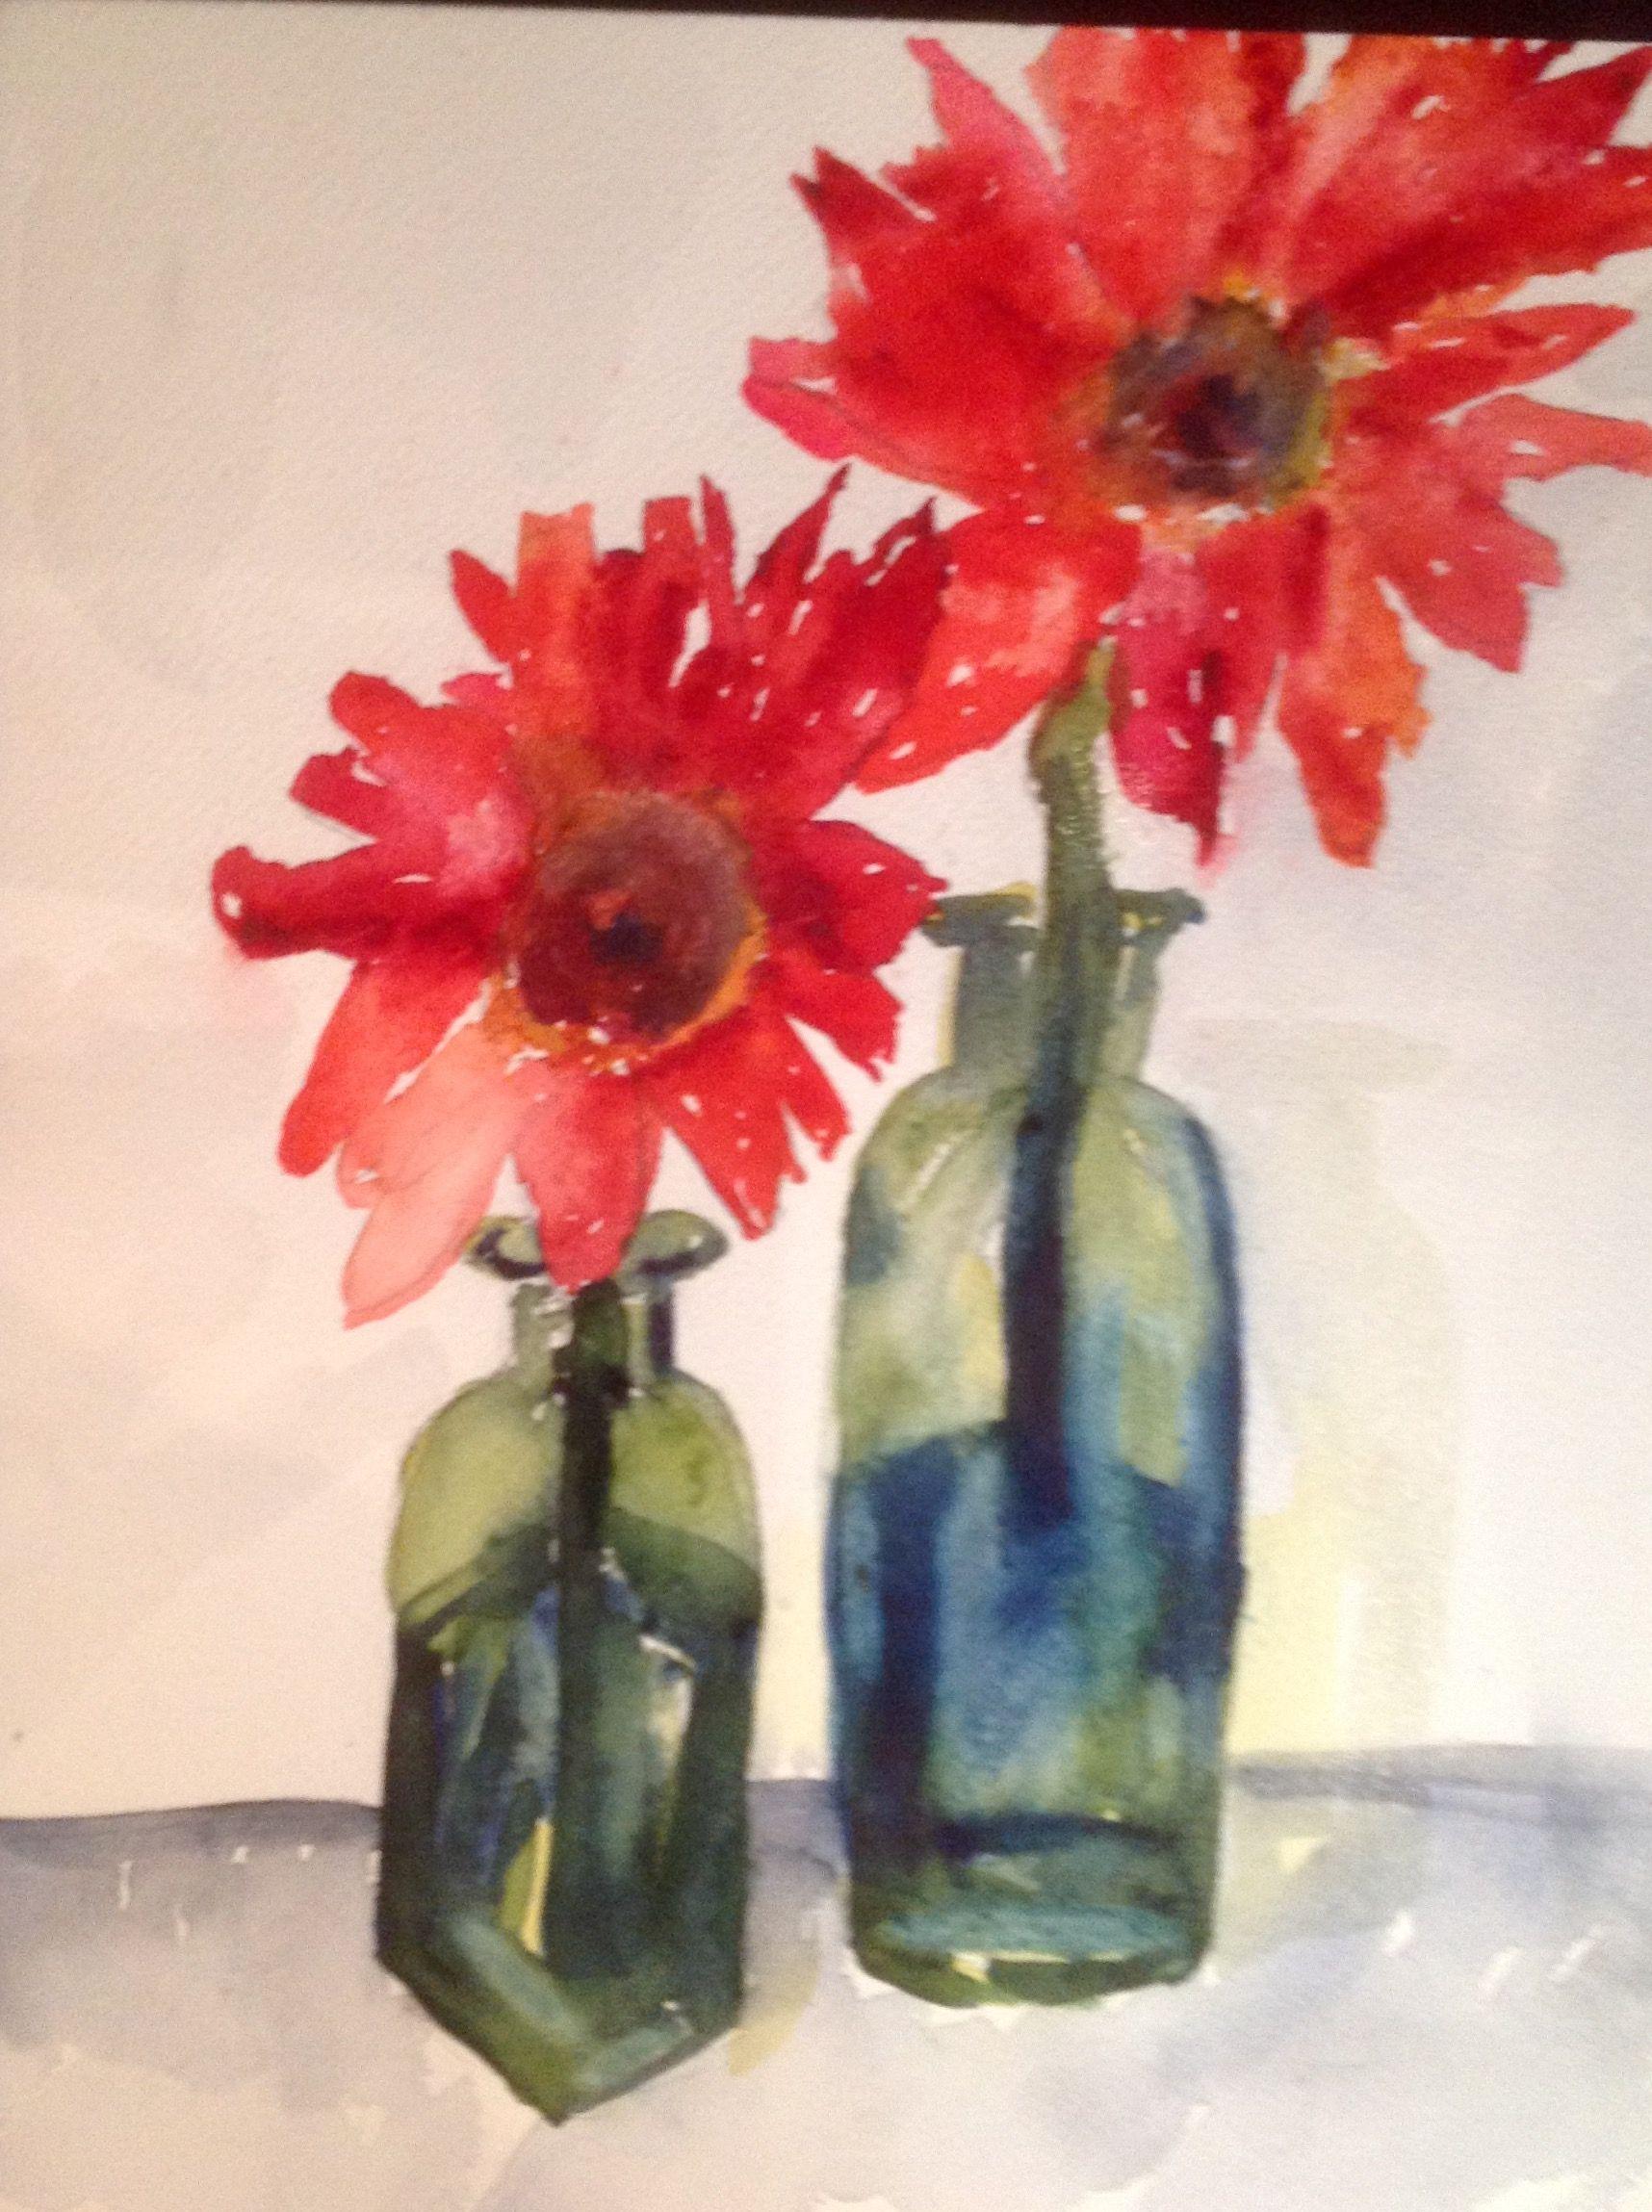 Watercolor artists in texas -  Flowers In Jars By Texas Watercolor Artist Karen Scherrer